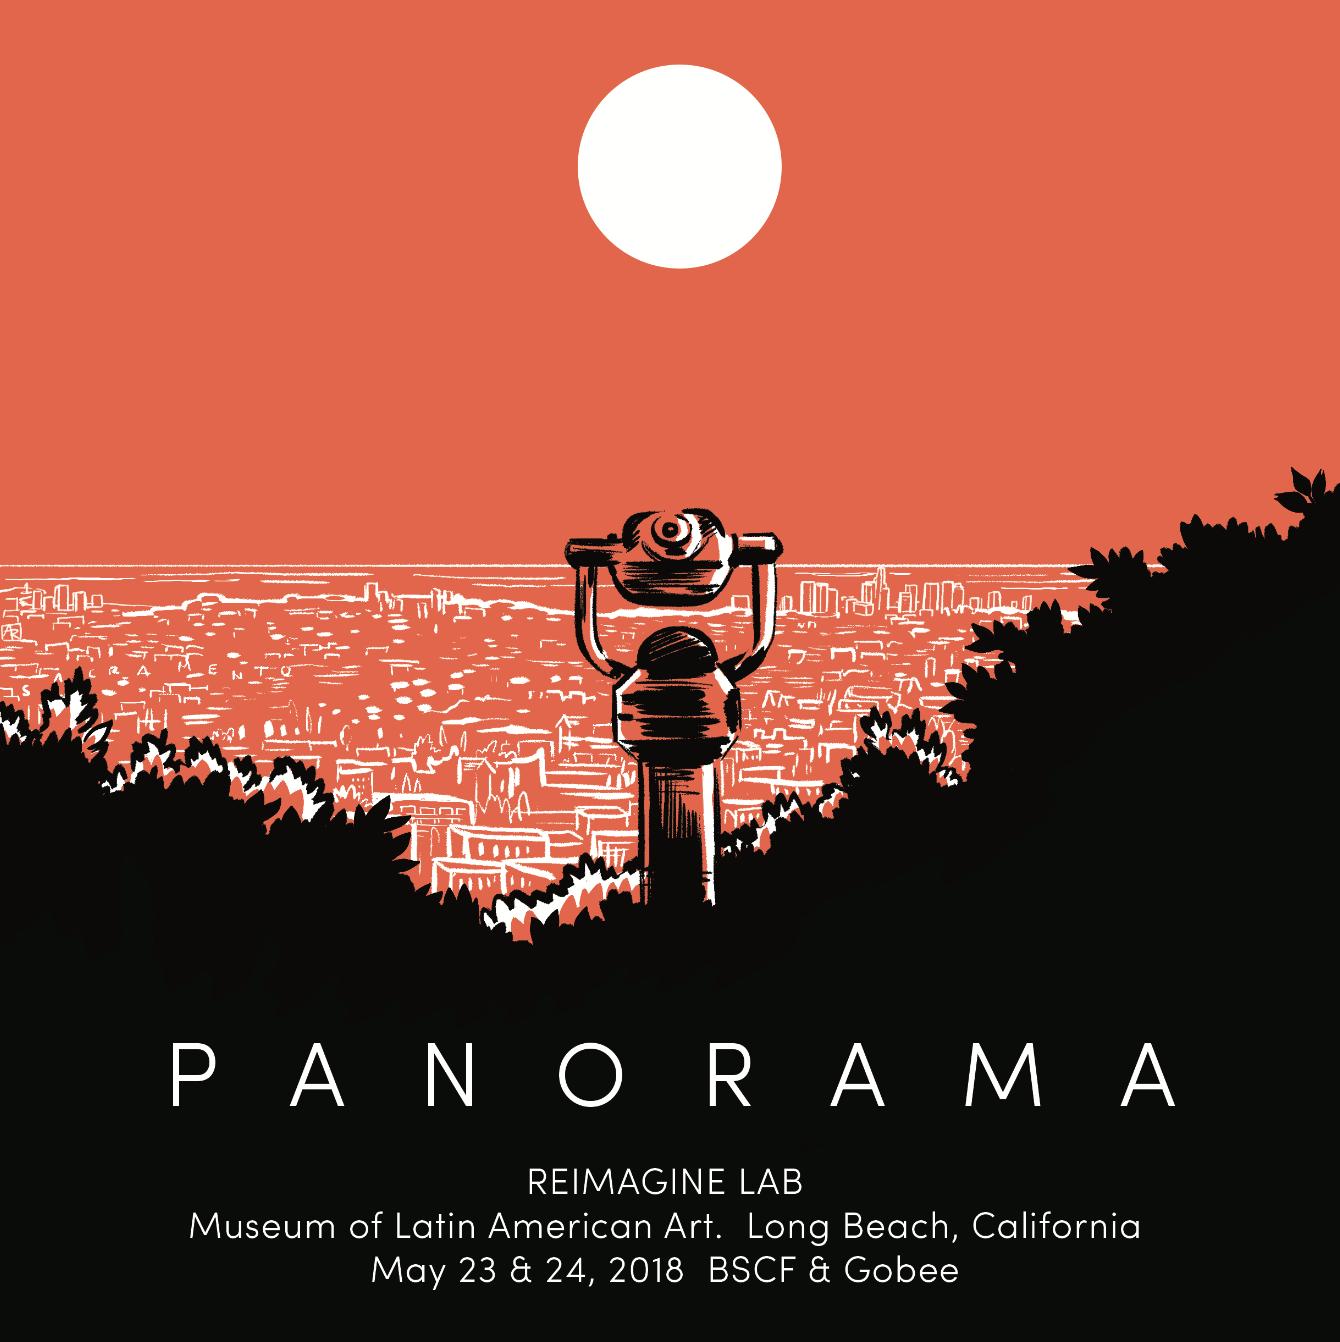 long-beach-illustration-poster-design-panorama.png